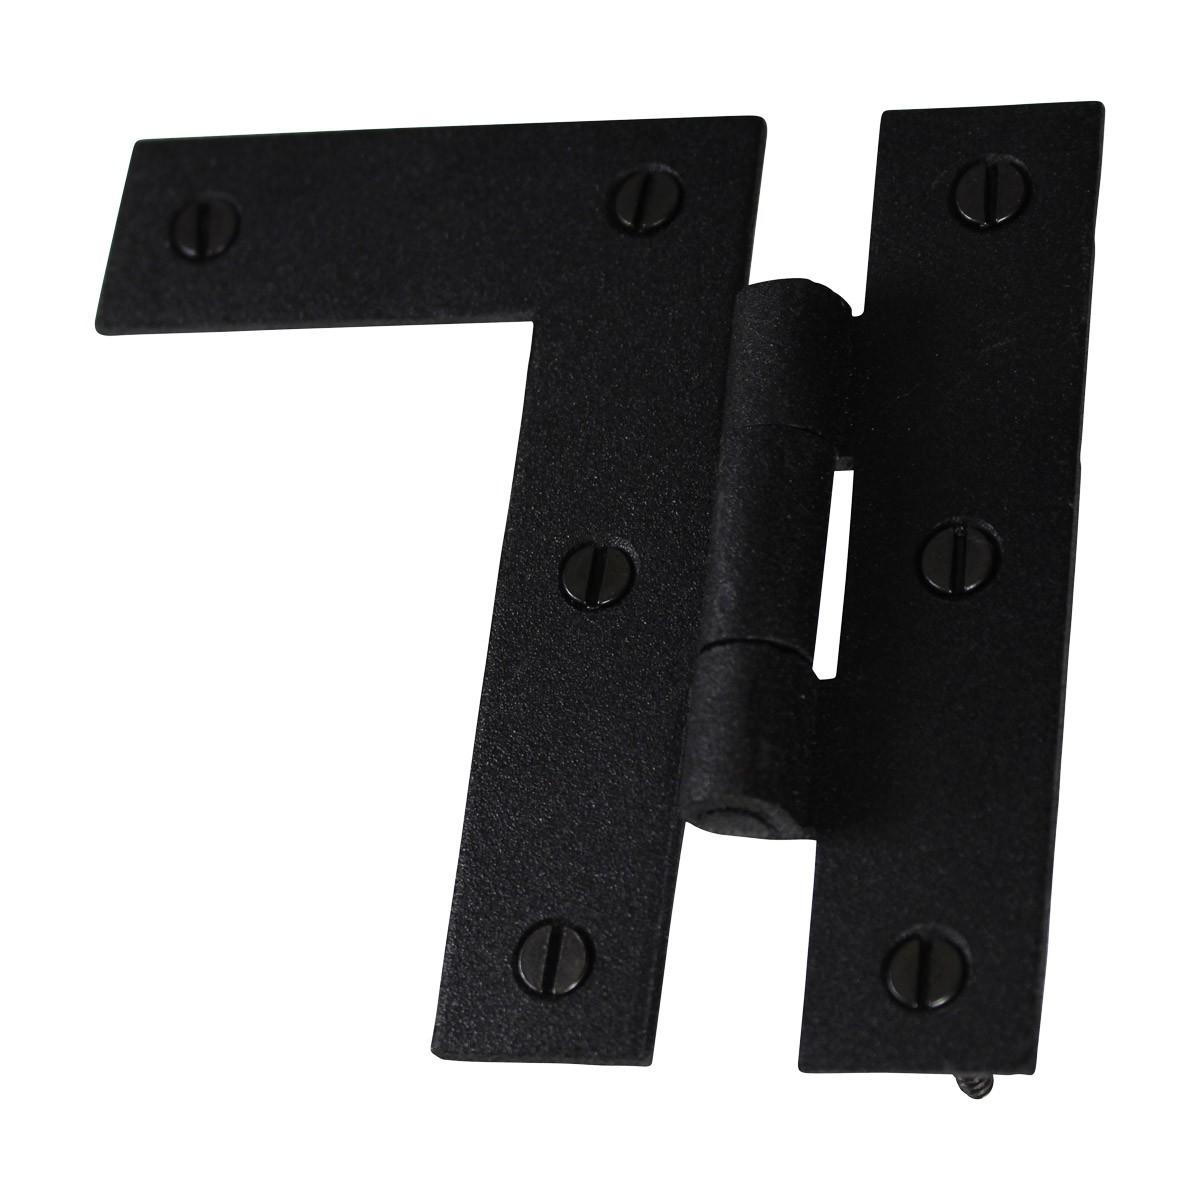 HL Flush Cabinet Hinge Black Wrought Iron Left 3.5H Wrought Iron Cabinet Hinges H Cabinet Hinges Black Door Hinges